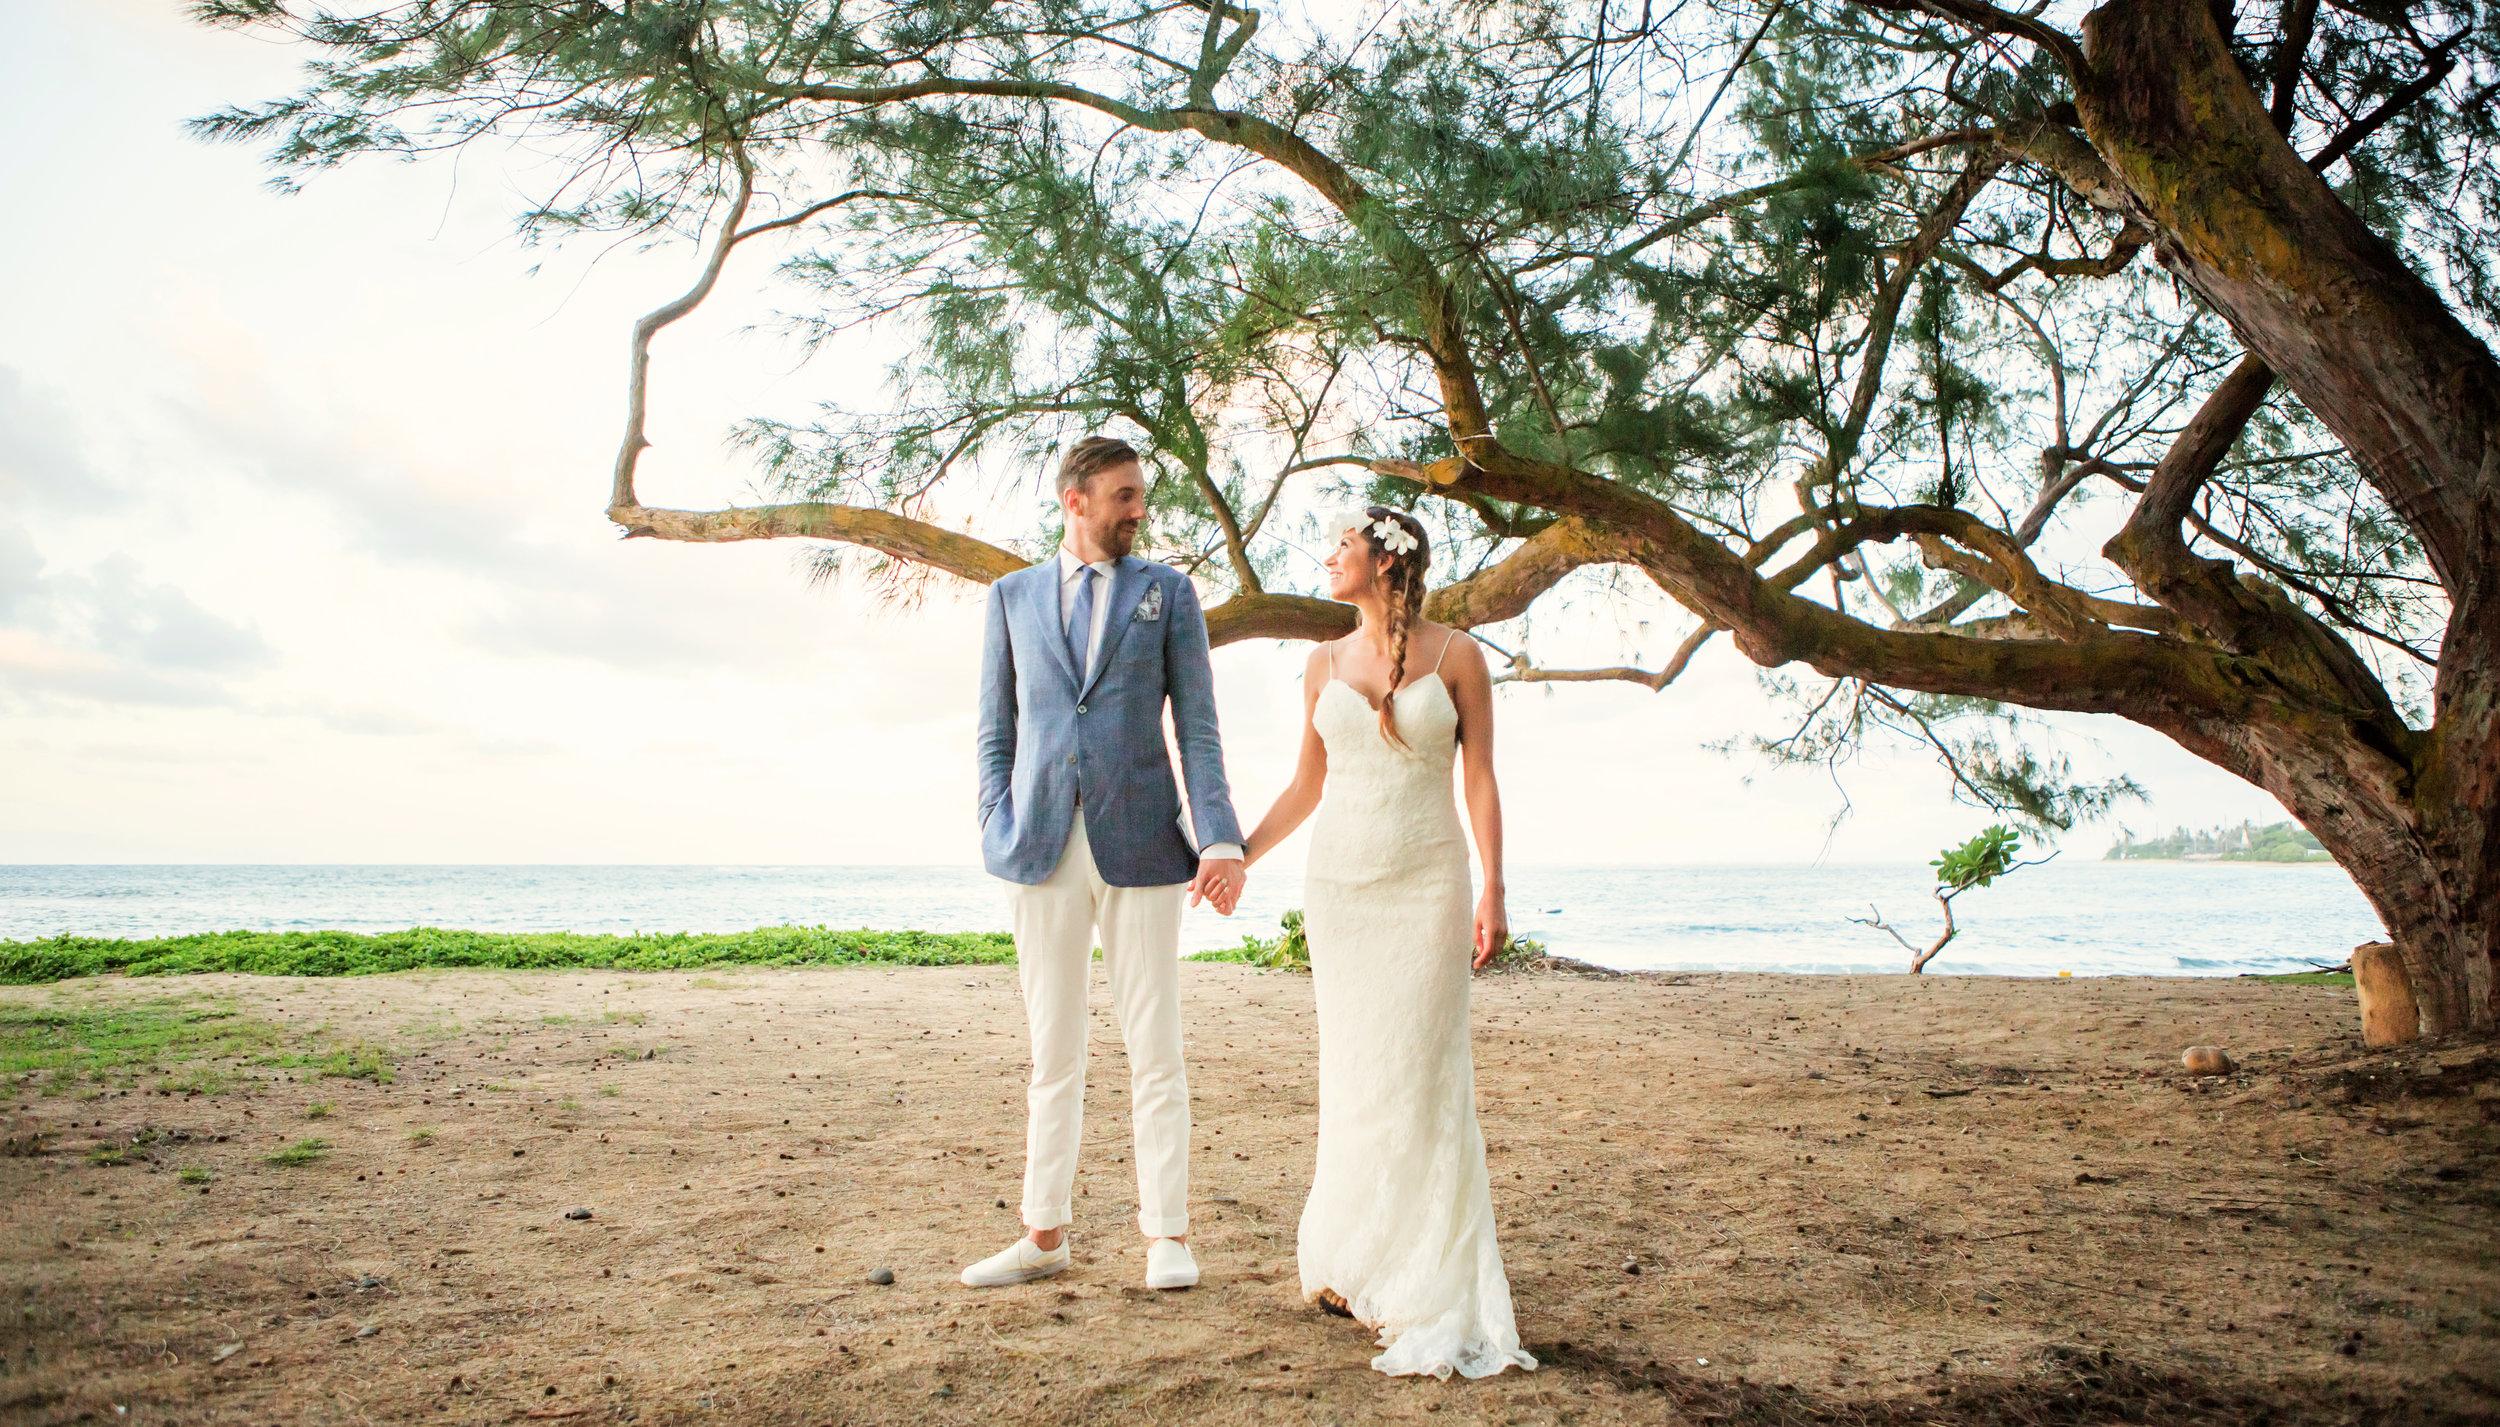 Angelica and Tyler's tropical wedding 24.jpg